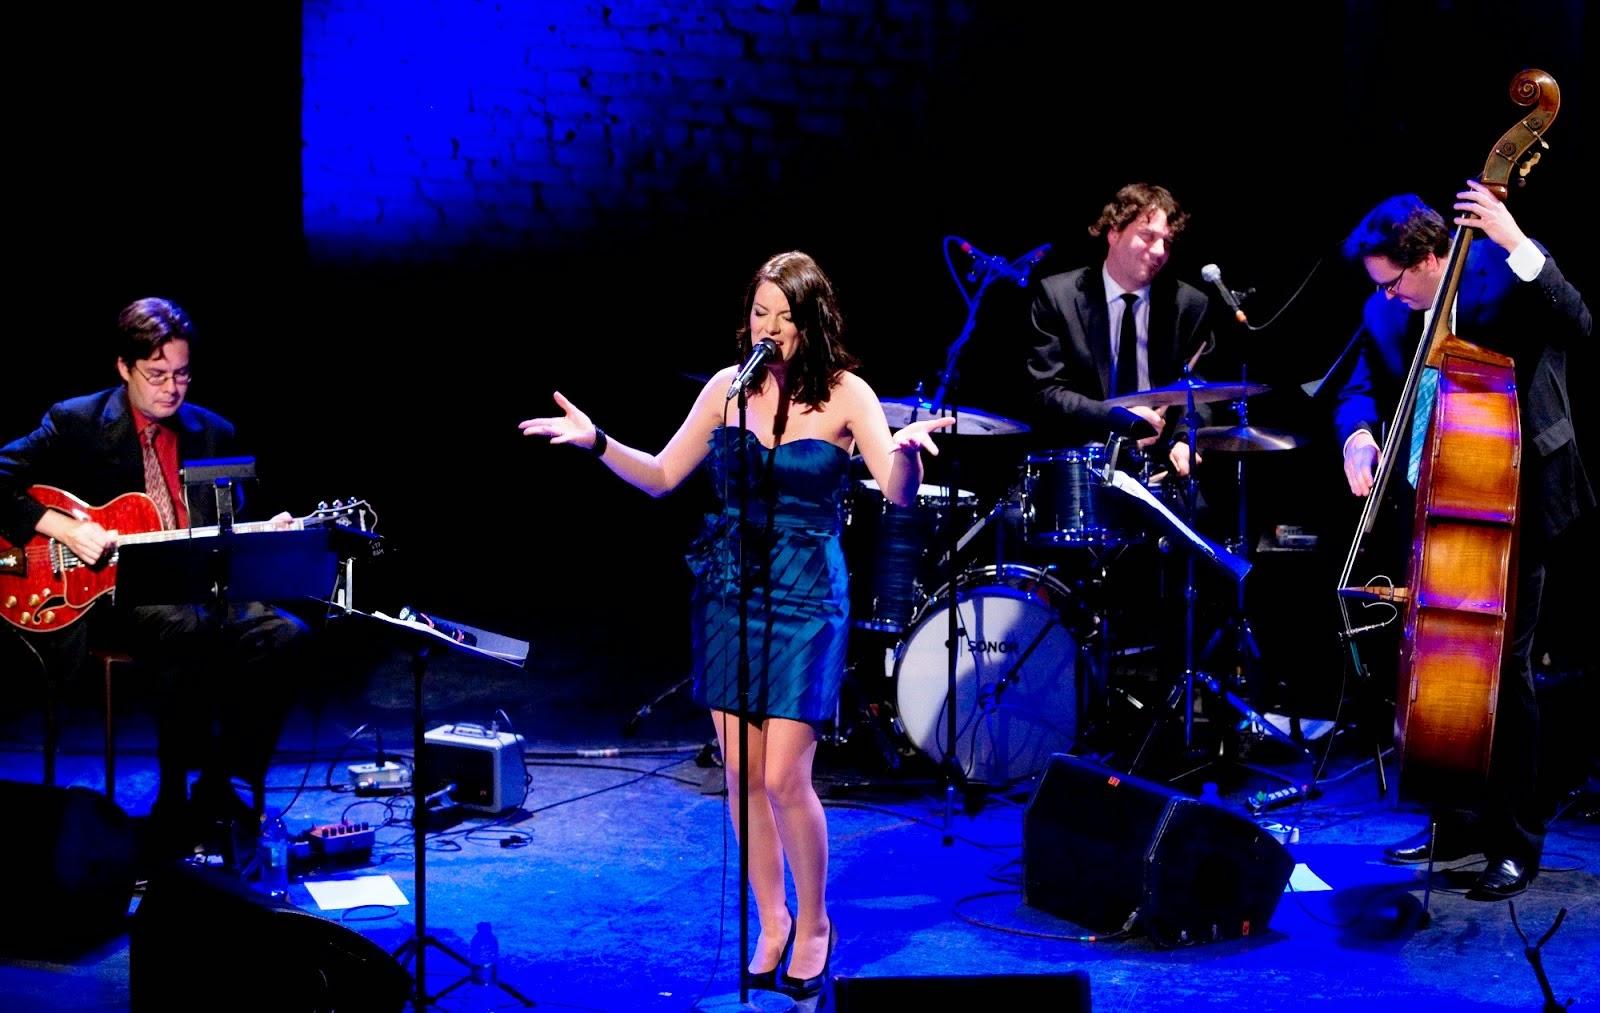 Emilie-Claire Barlow canta C´est si bon . Esta noche en el Blues Carichi